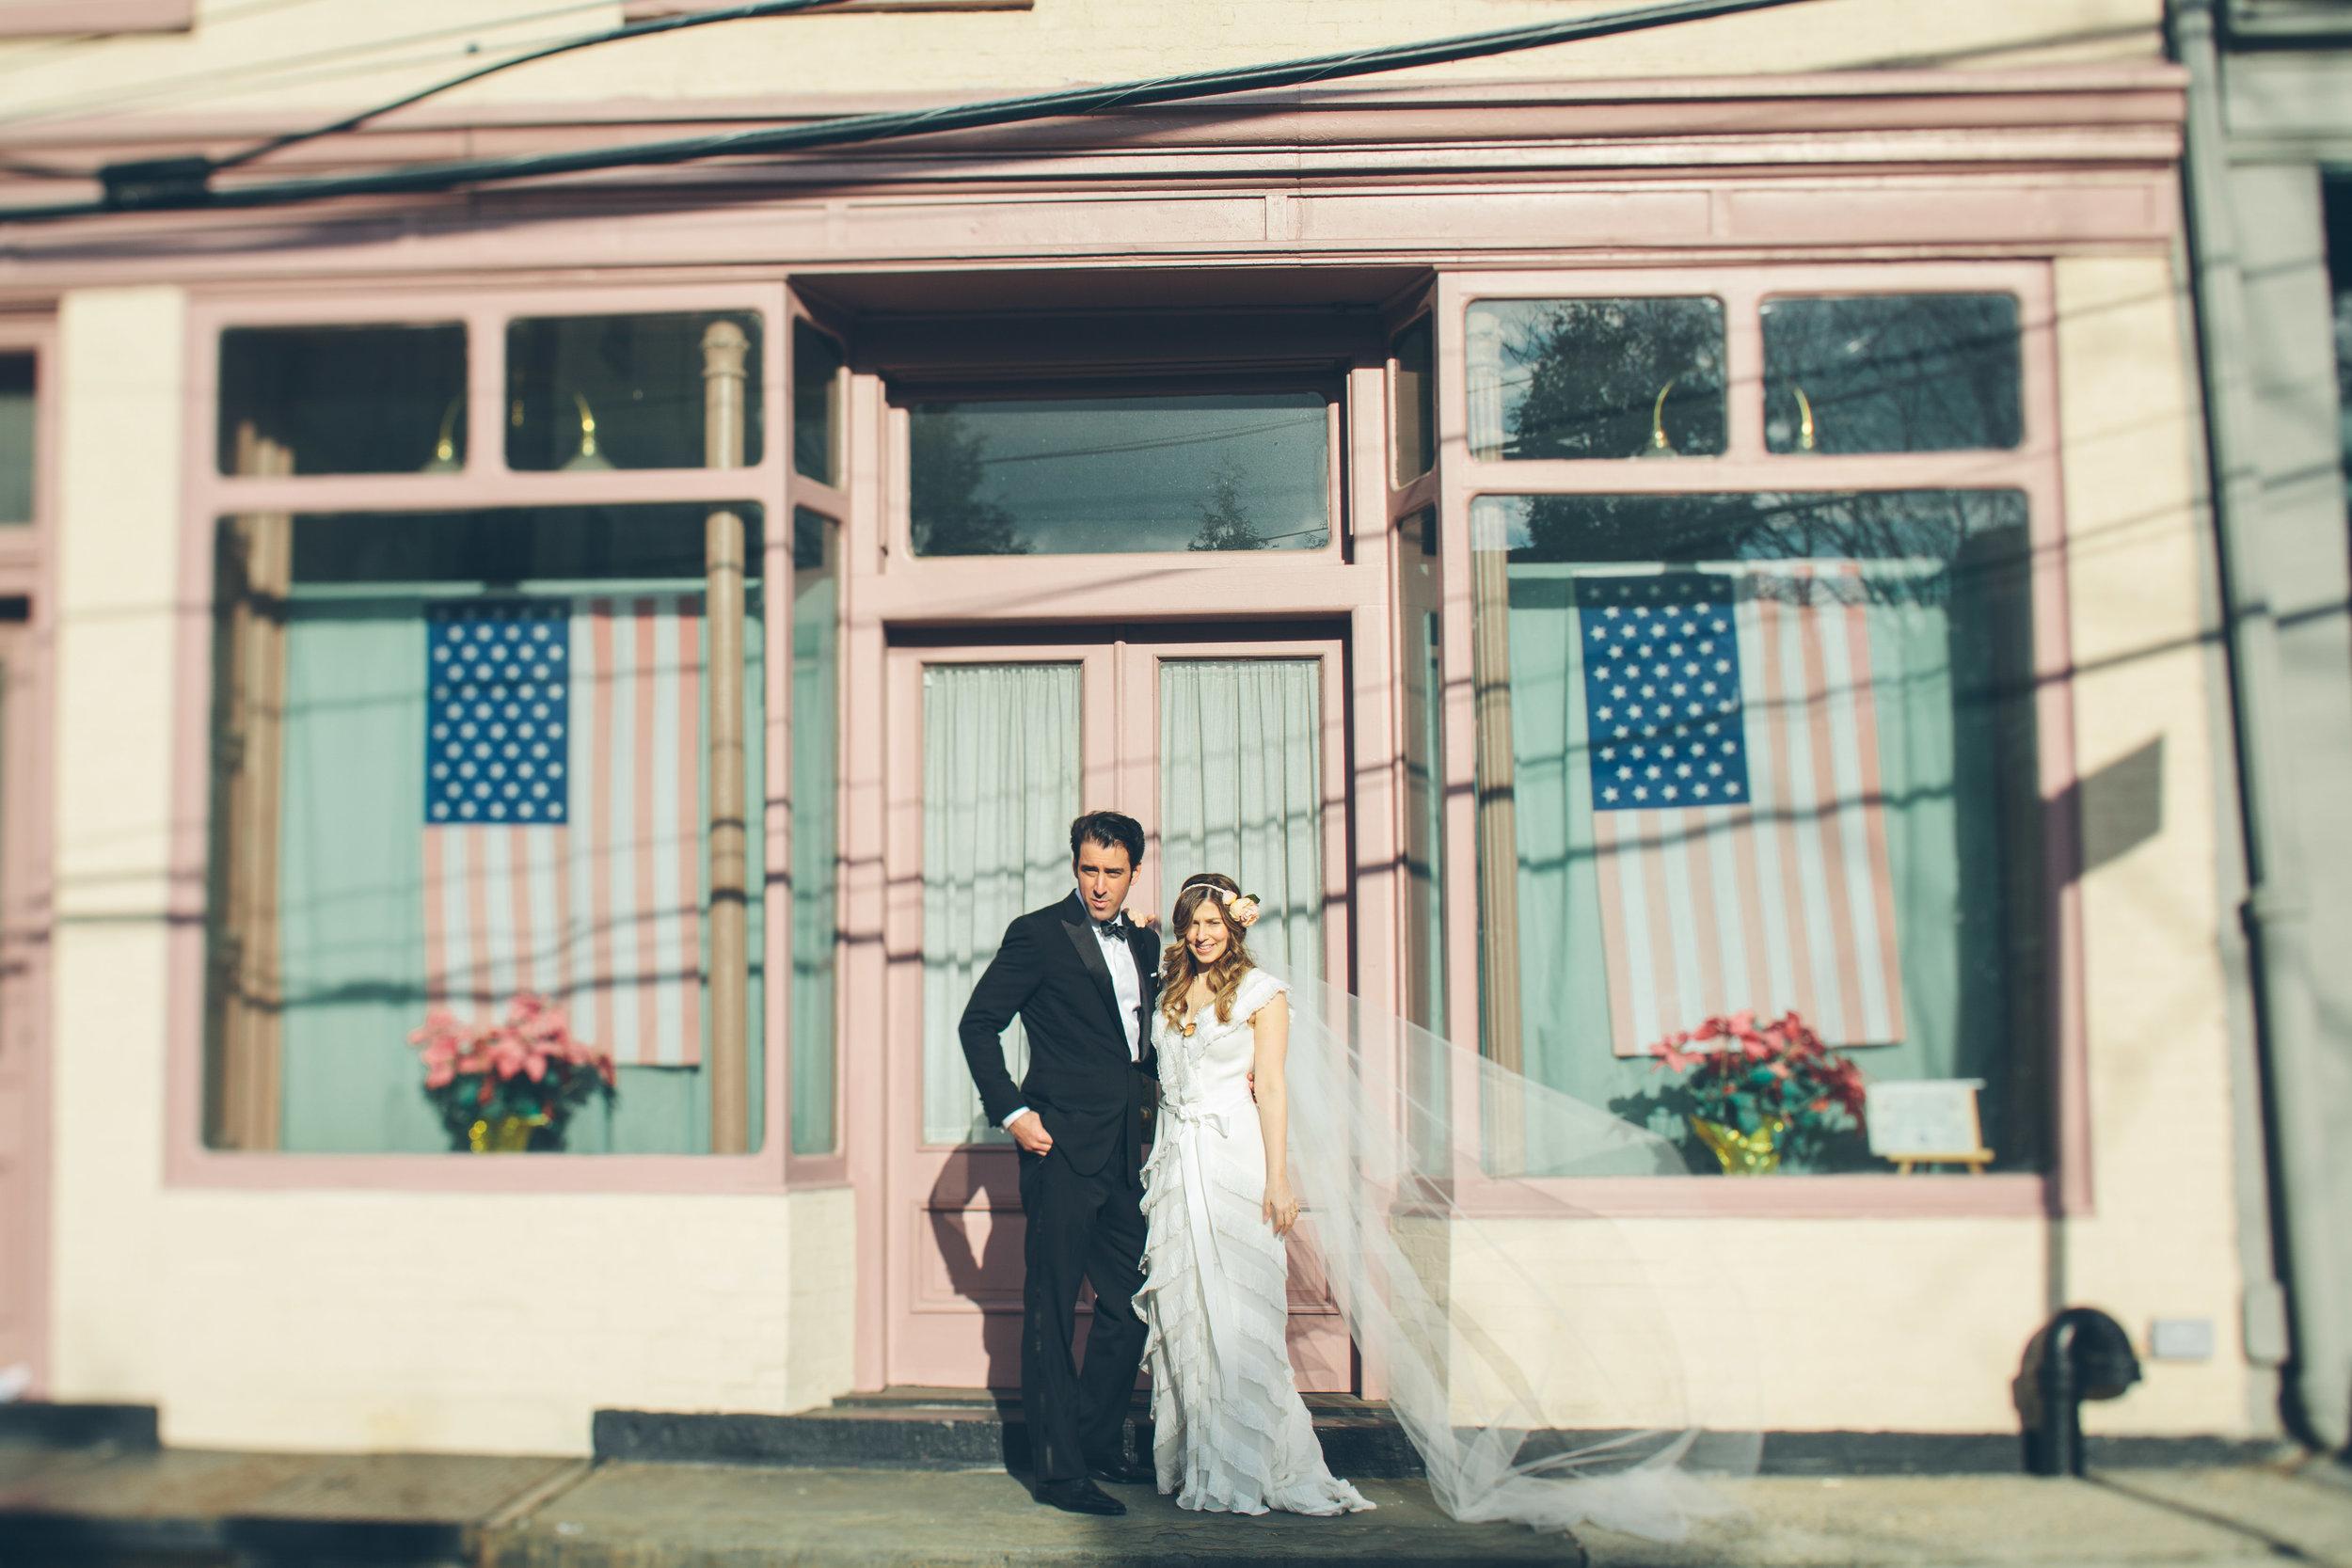 NYC WEDDING: JENNIFER & RYAN